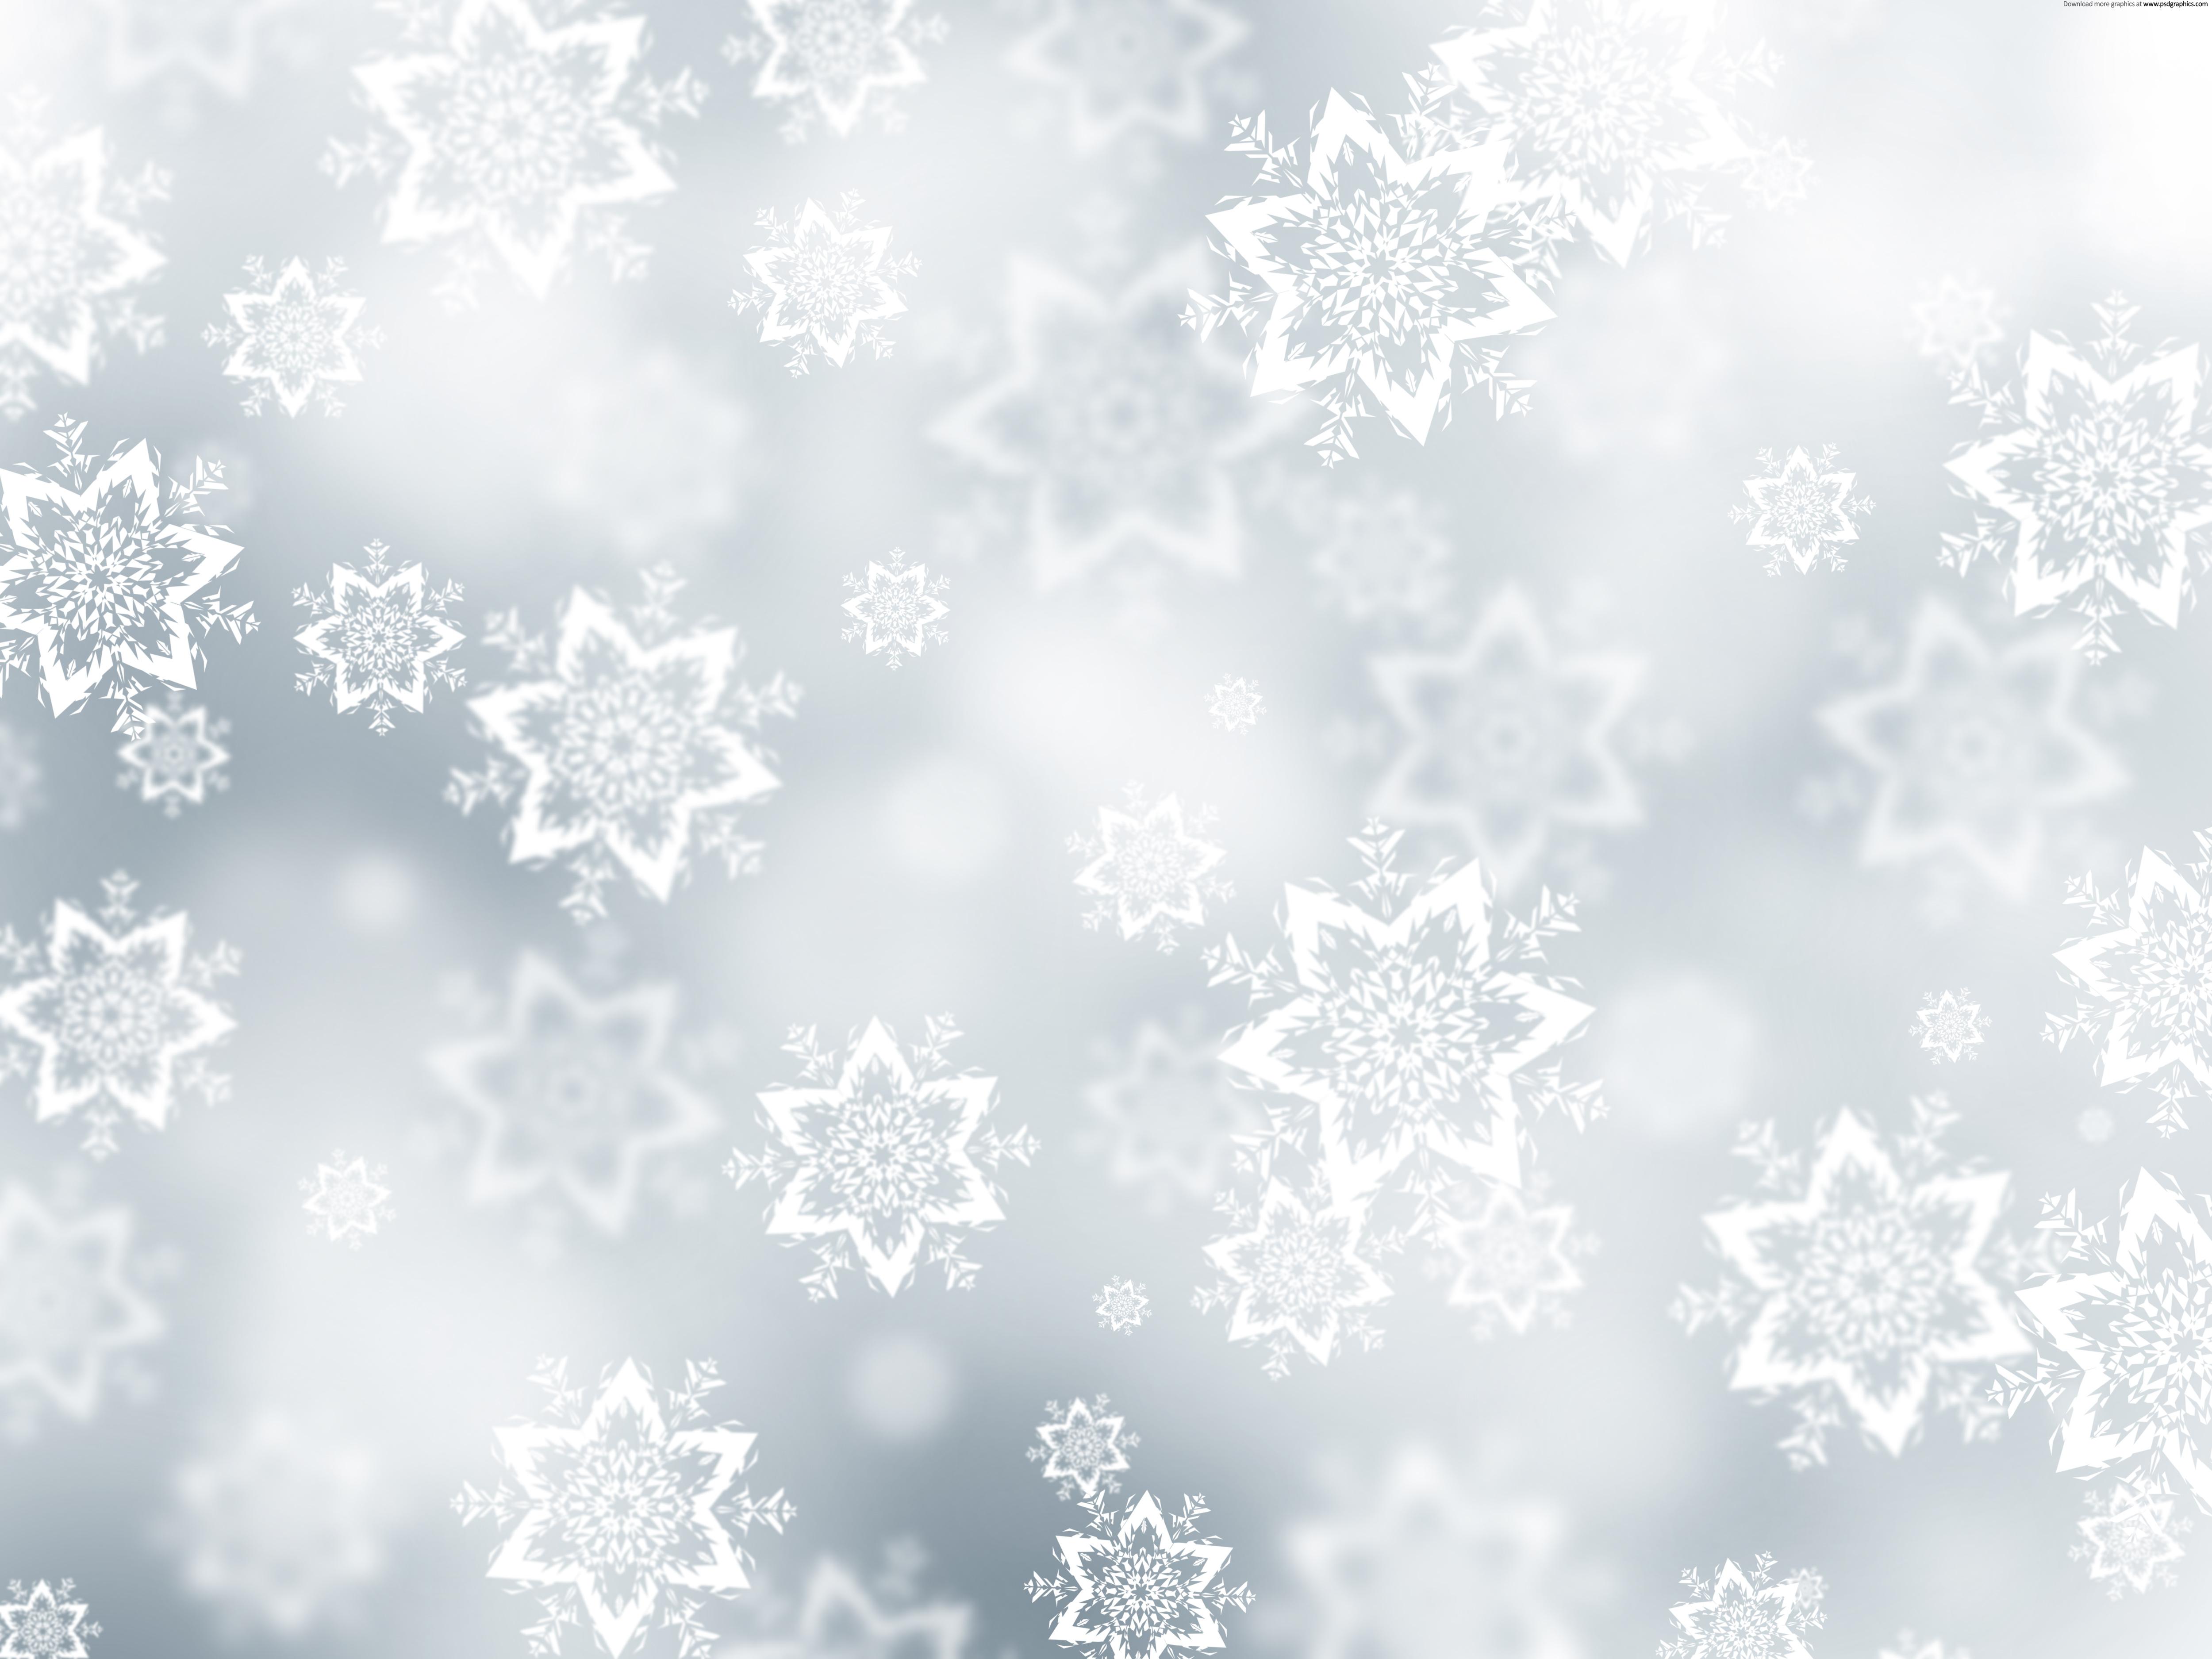 Christmas snow background PSDGraphics 5000x3750